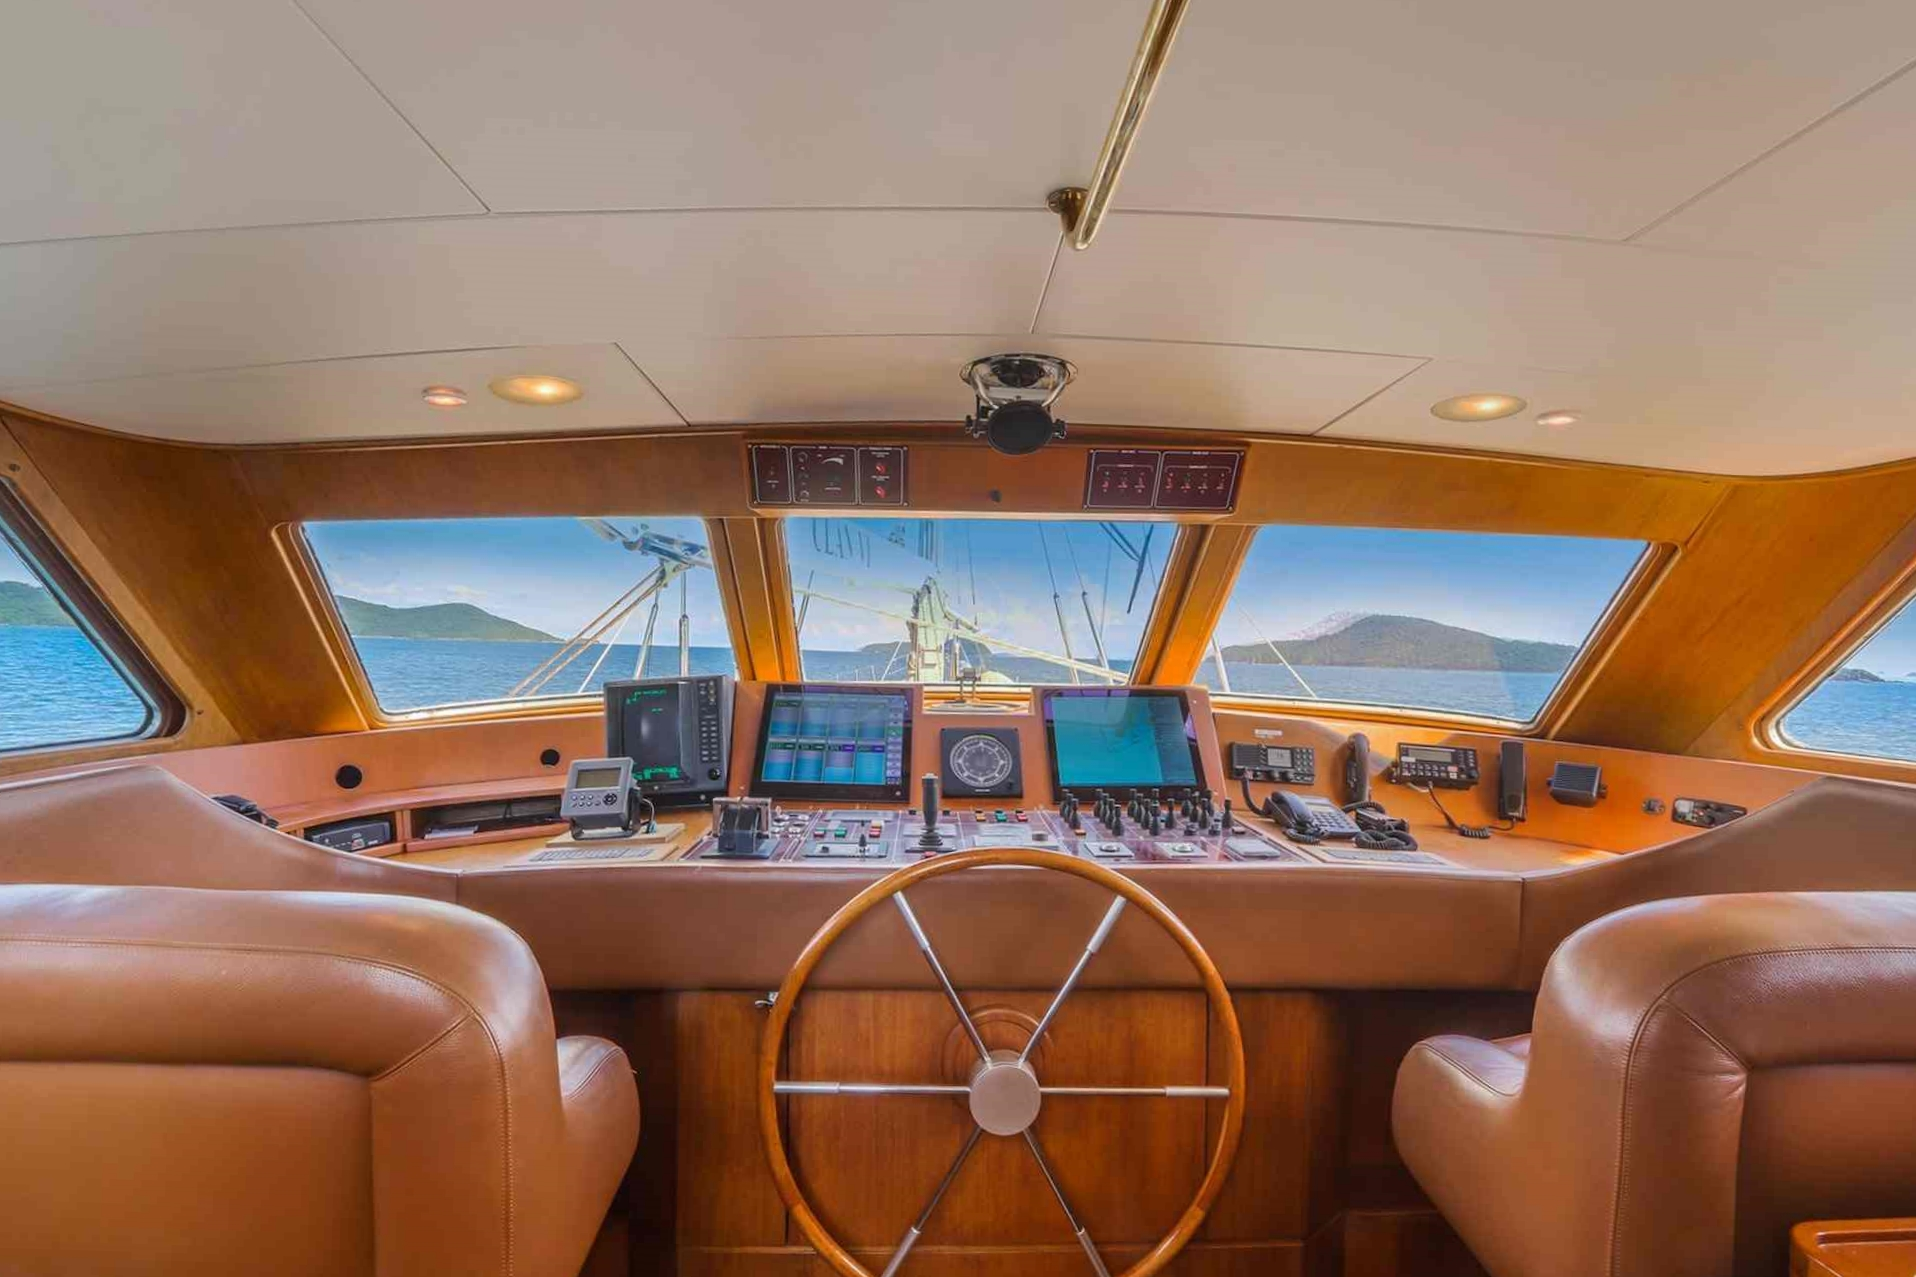 Clan VI_pilot house sailing in Mergui_XS.jpeg